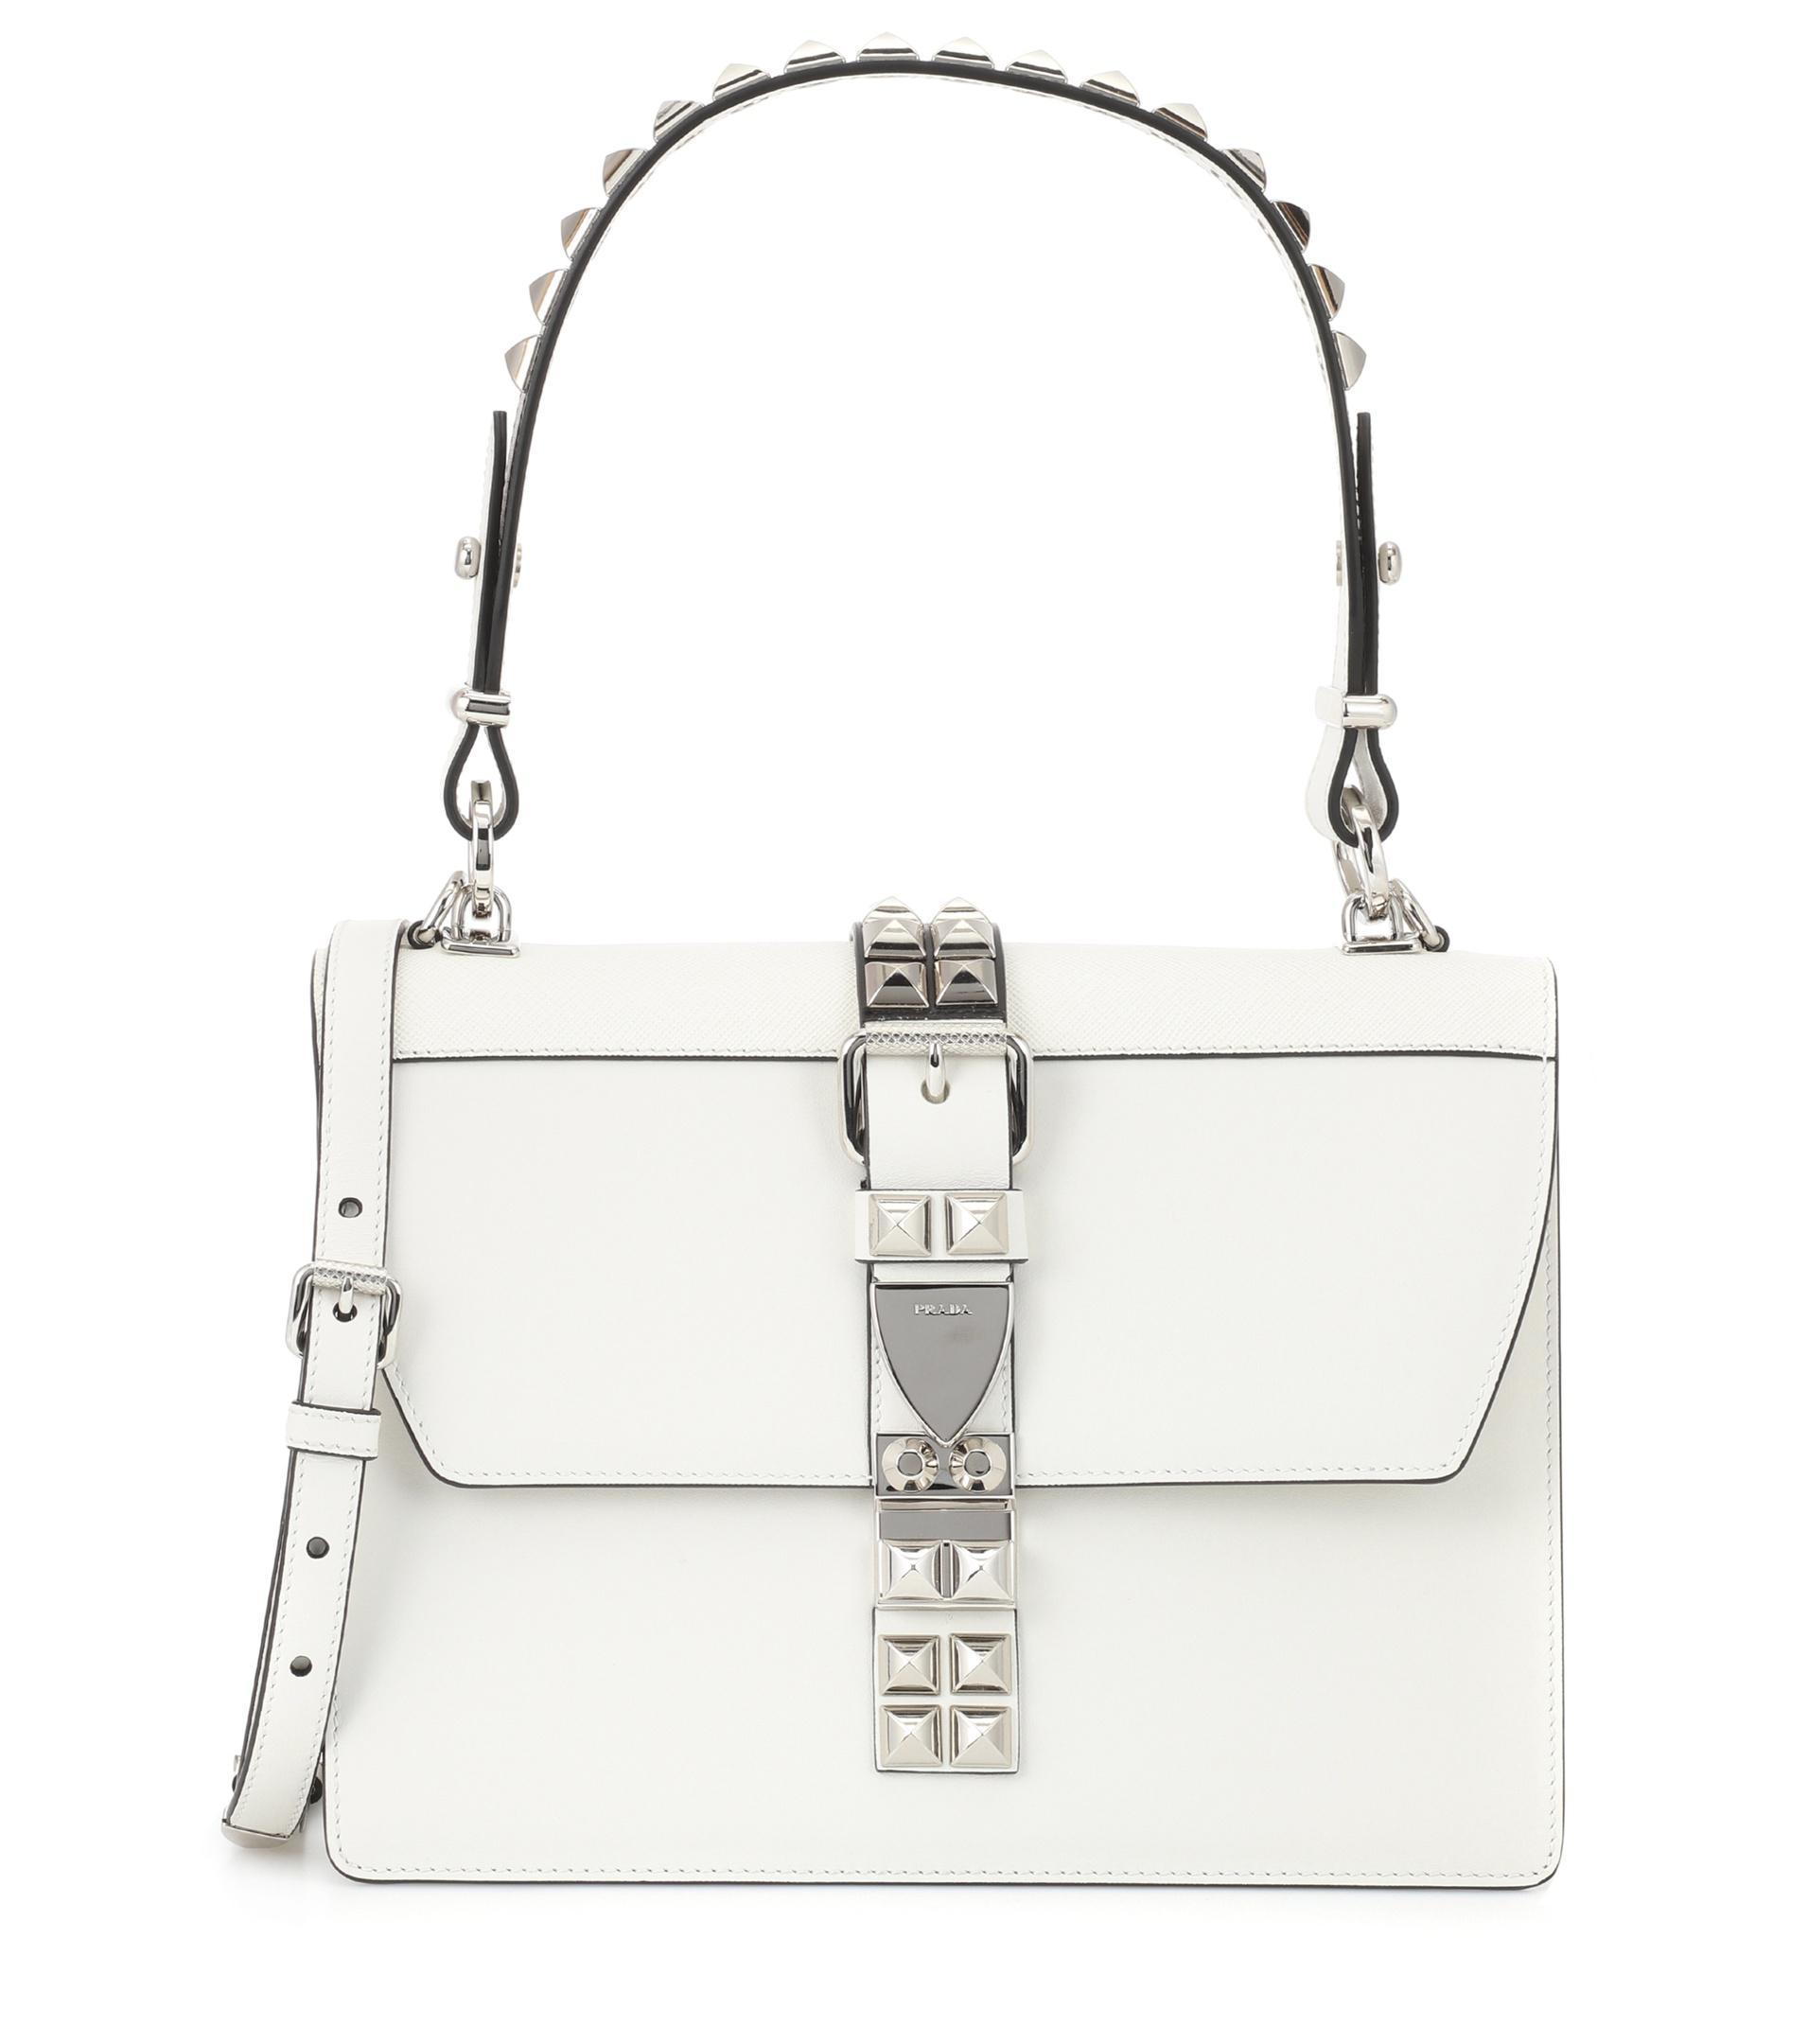 6554b764fe88 Prada Elektra Leather Shoulder Bag in White - Lyst